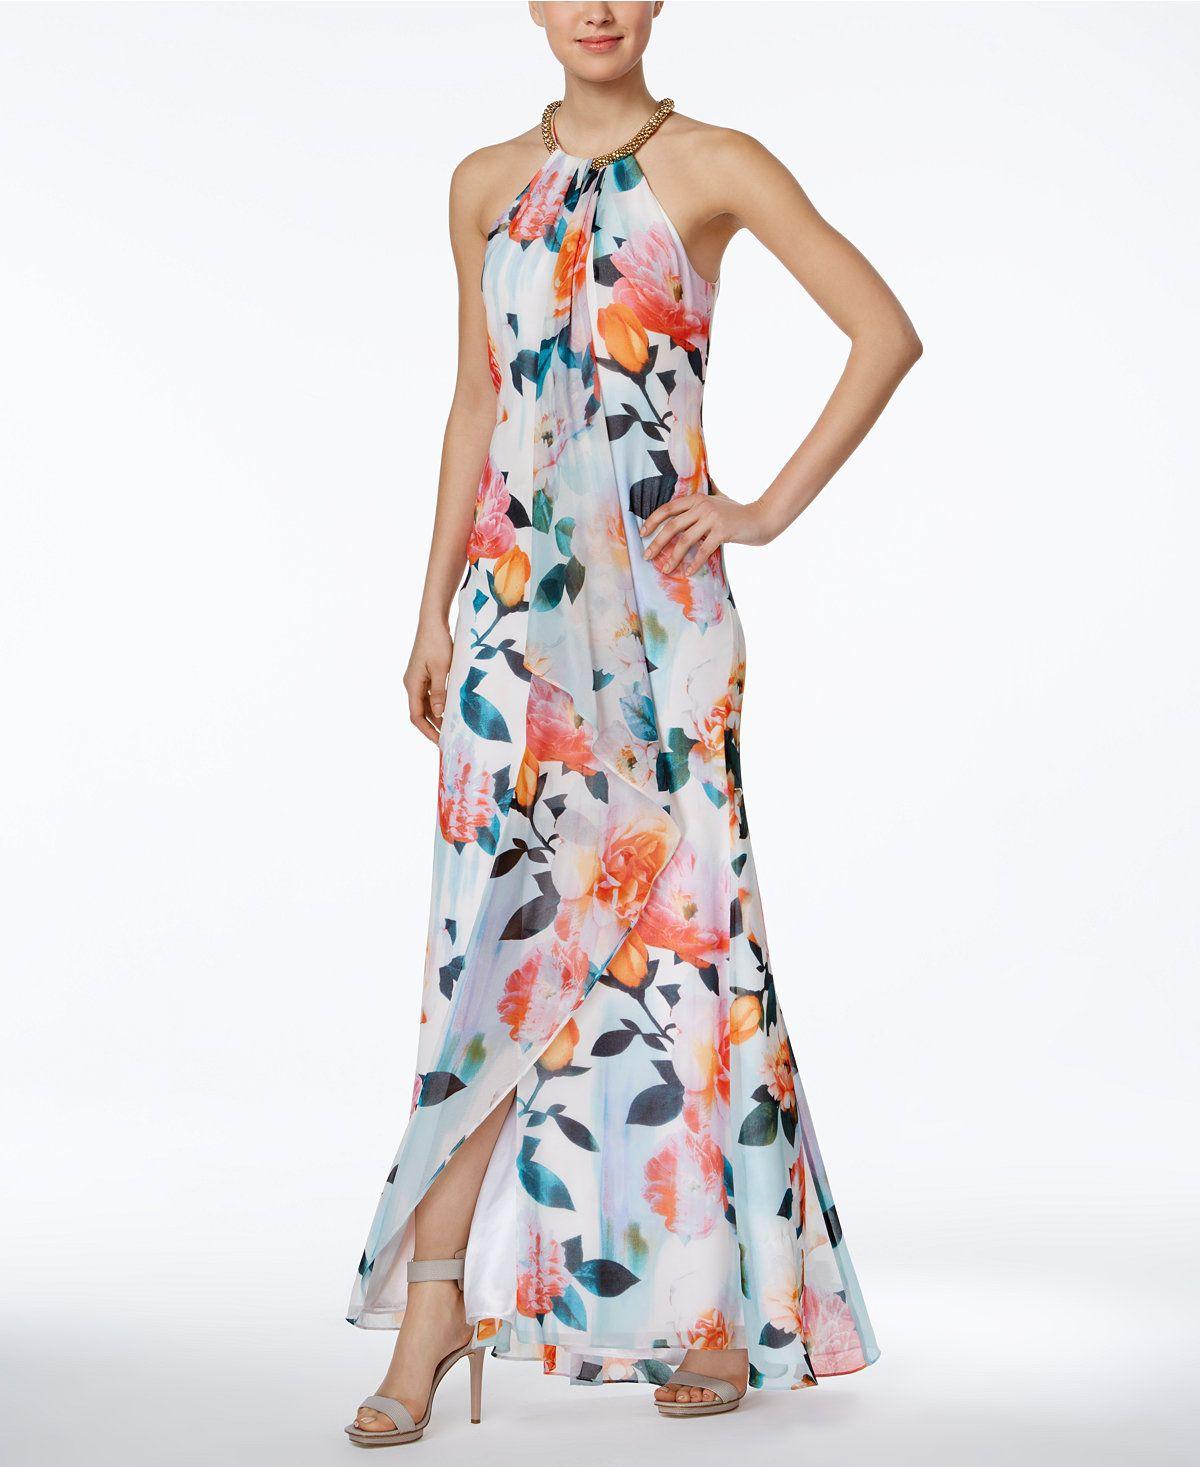 3164e8aa92501 Calvin Klein Draped Floral-Print Halter Gown - Dresses - Women - Macy's